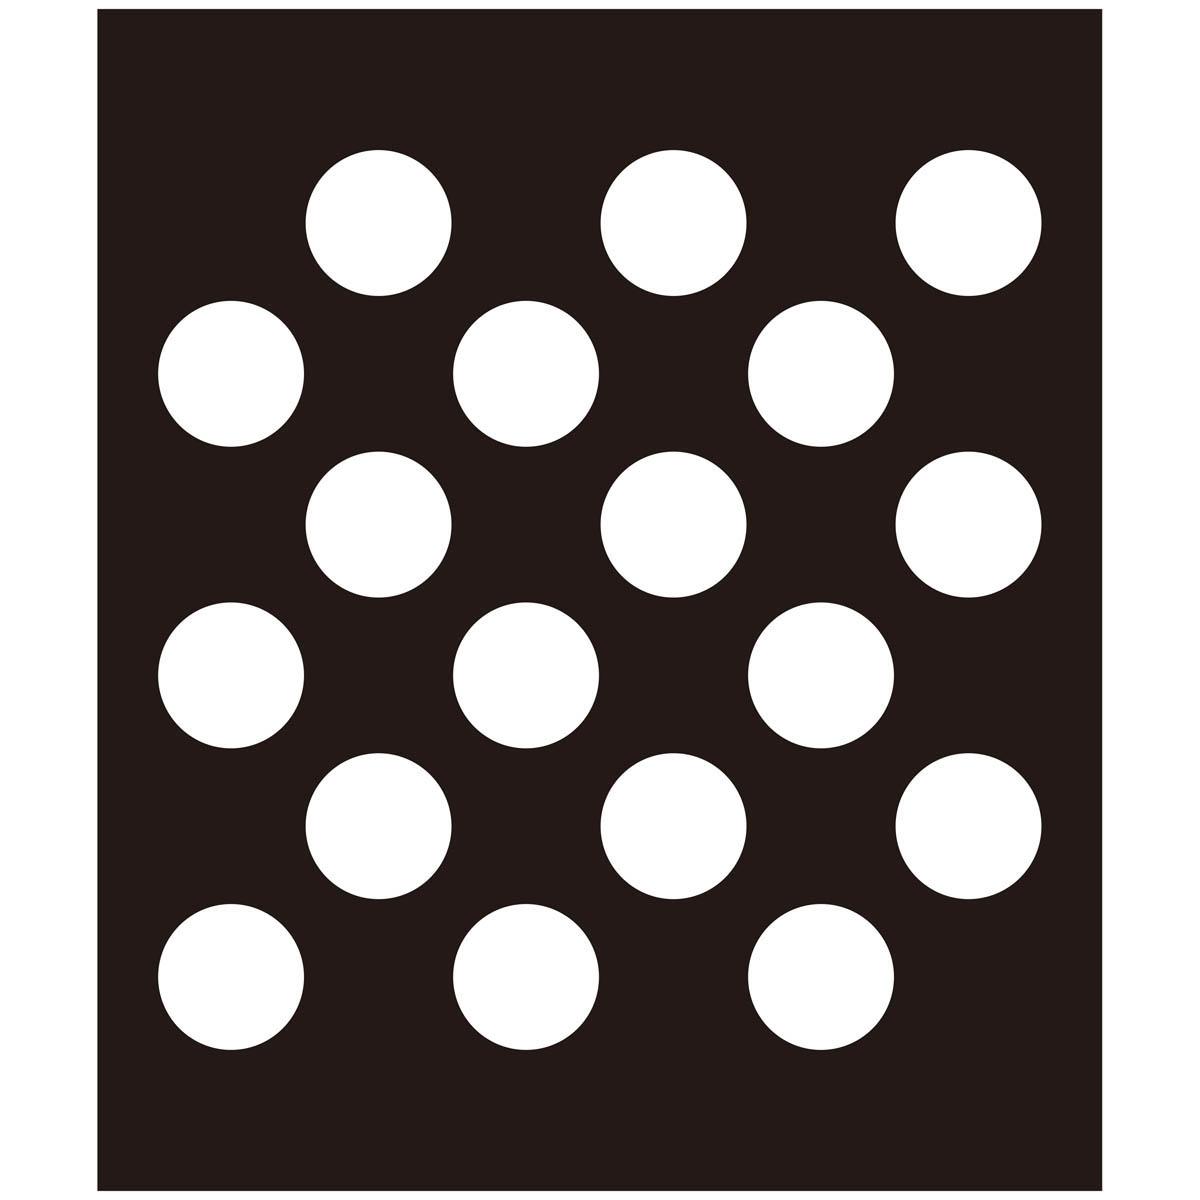 FolkArt ® Painting Stencils - Large - Polka Dot - 4375